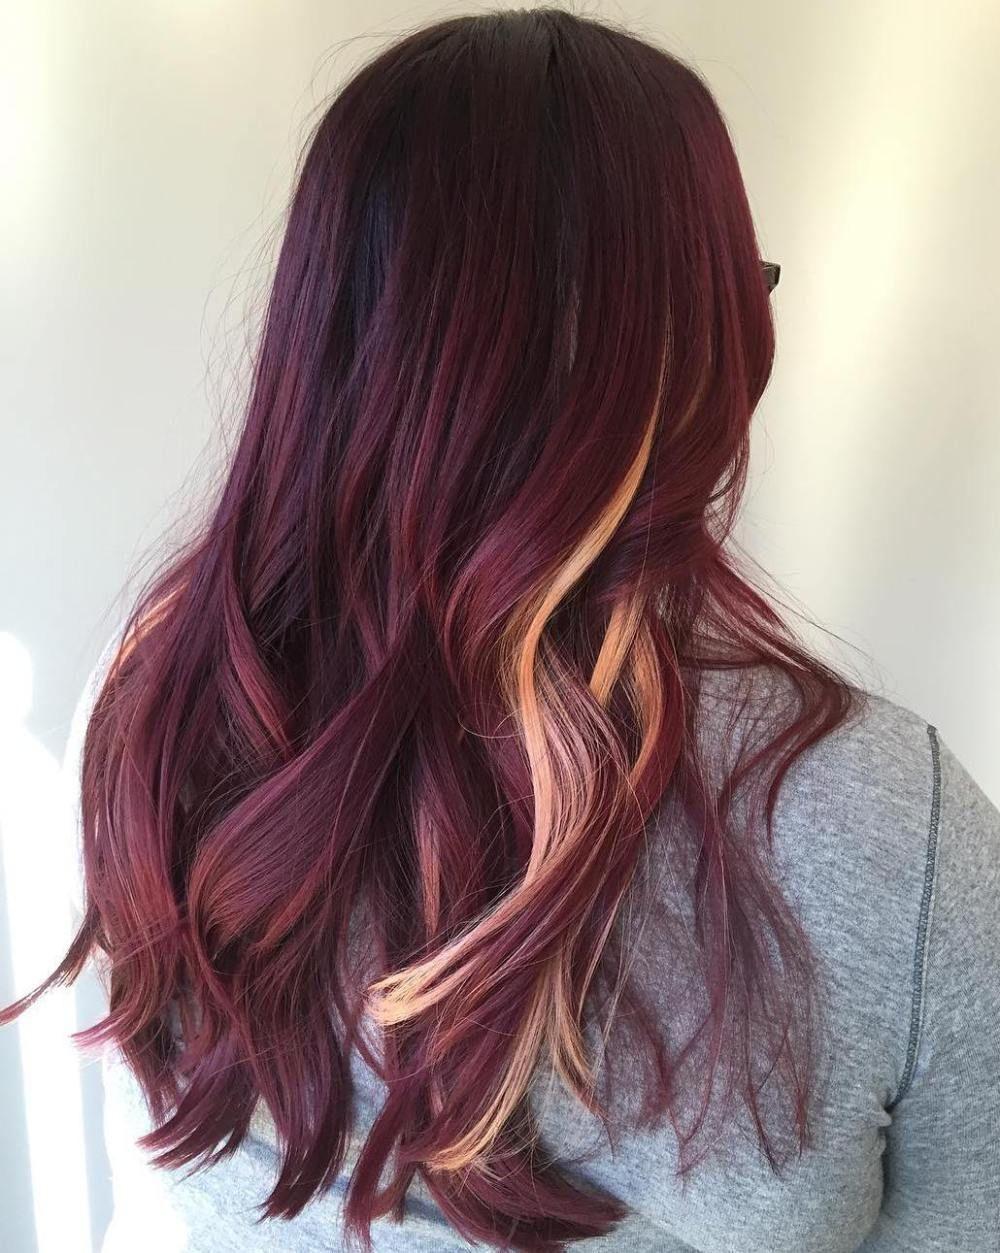 45 Shades of Burgundy Hair Dark Burgundy, Maroon